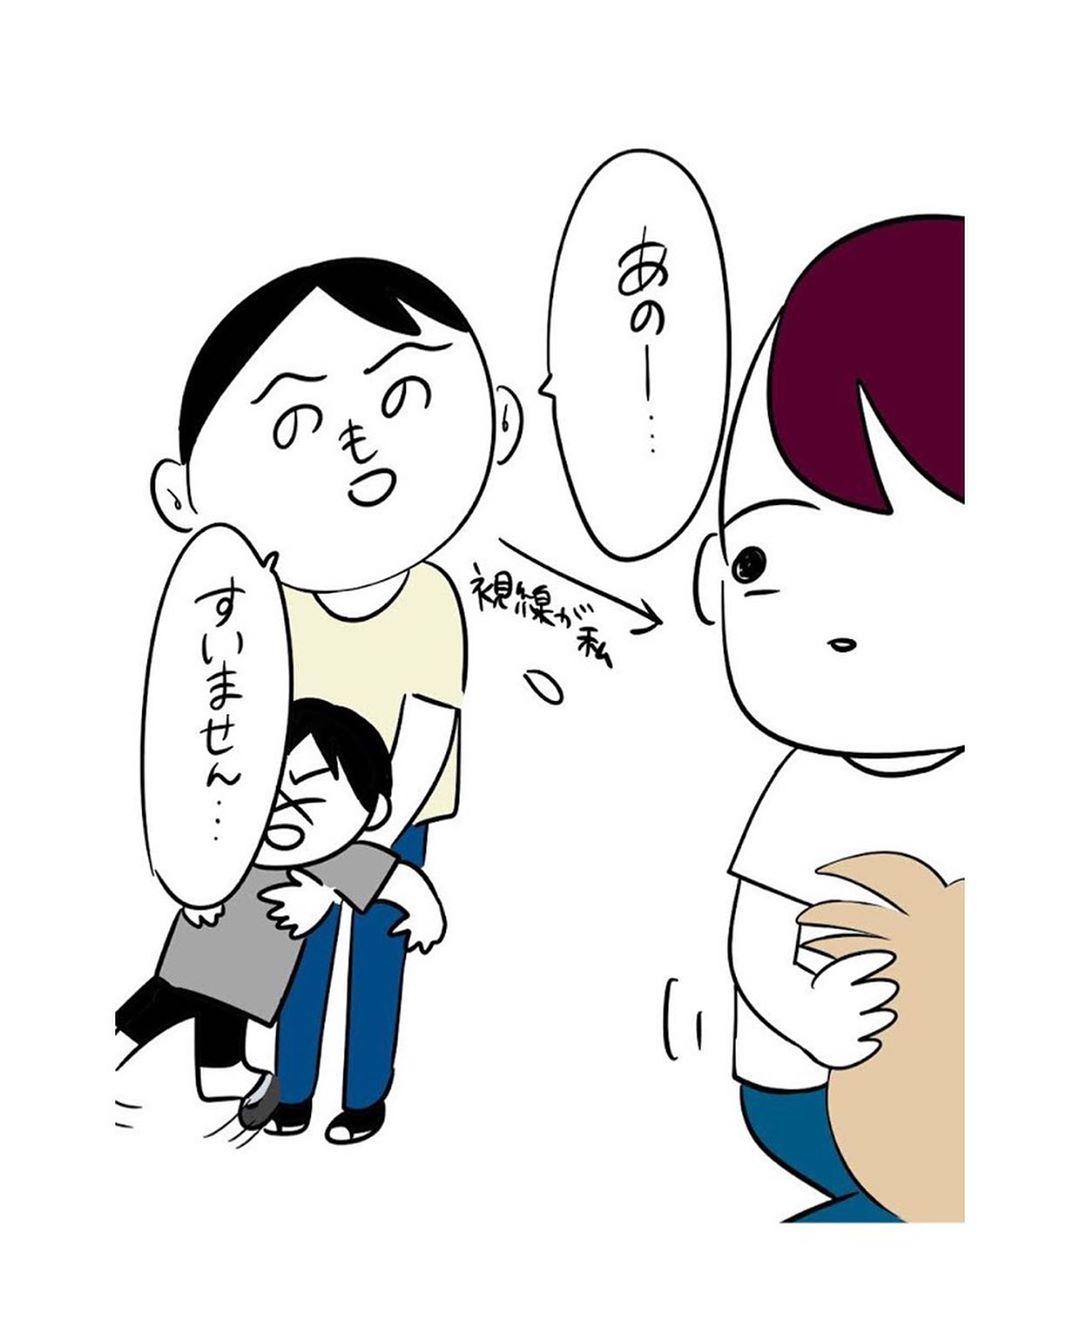 shirota.yunya_73210021_234065467575289_1698570540417728944_n